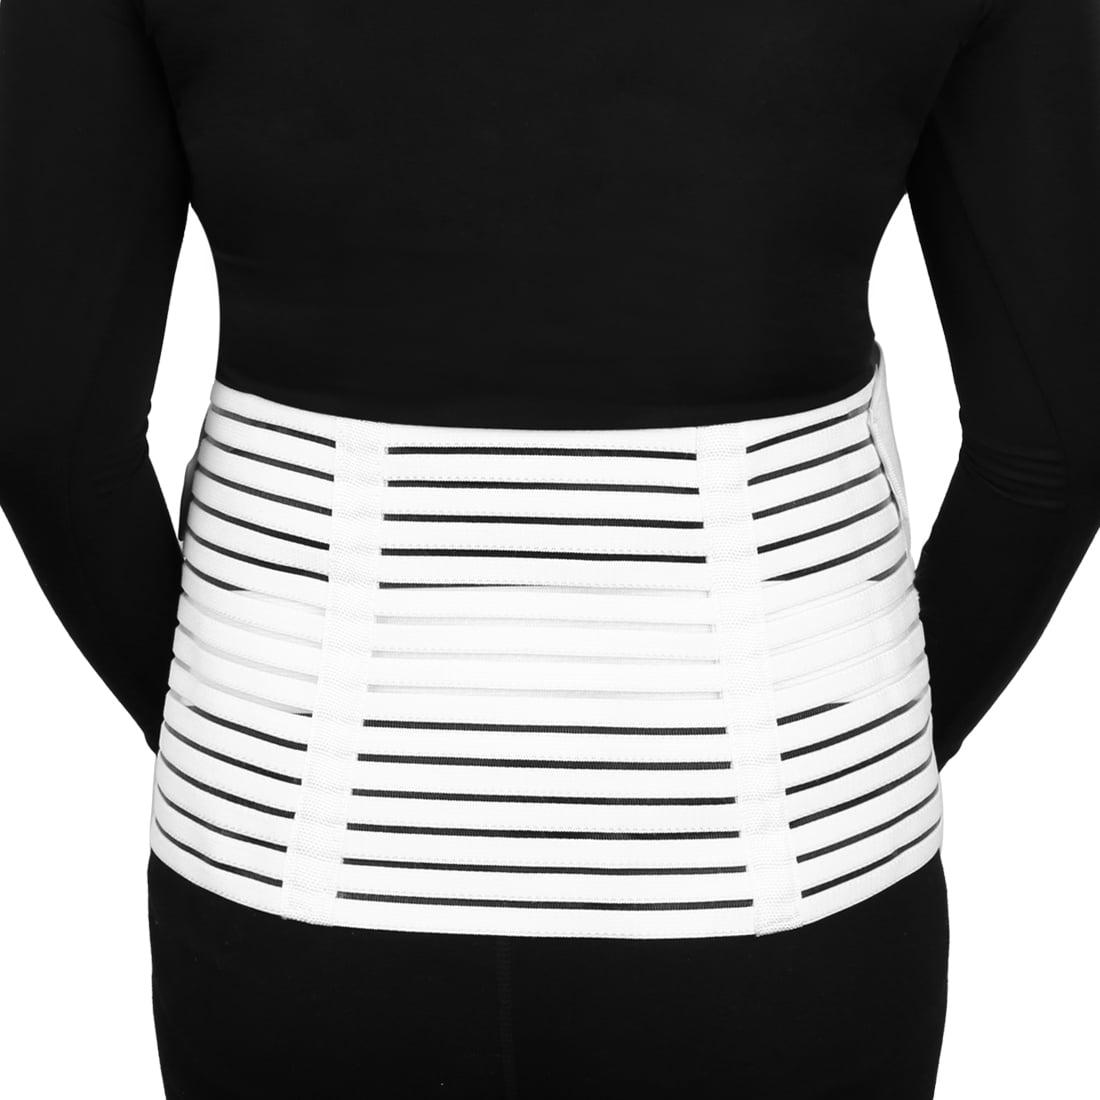 Belly Belts, Bands Baby Rapture Pregnancy Maternity Support Brace Strap Belt Abdominal Back Support Belly Band